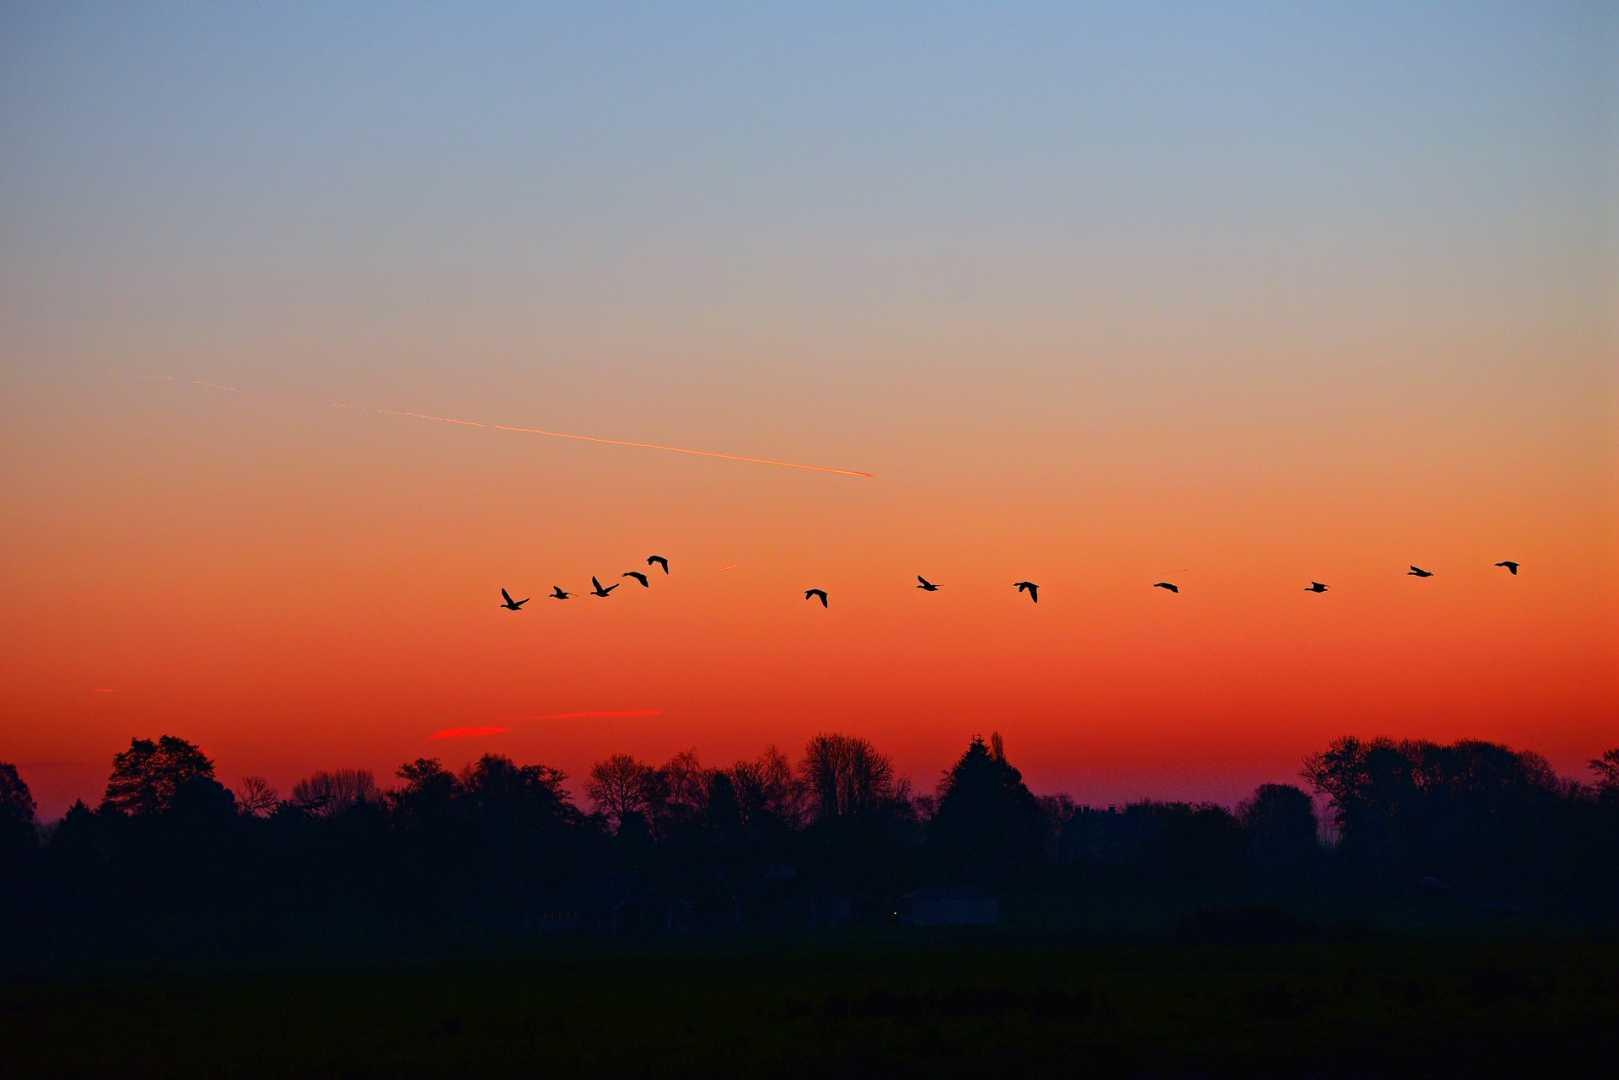 Sonnenaufgang mit Vögeln am Horizont